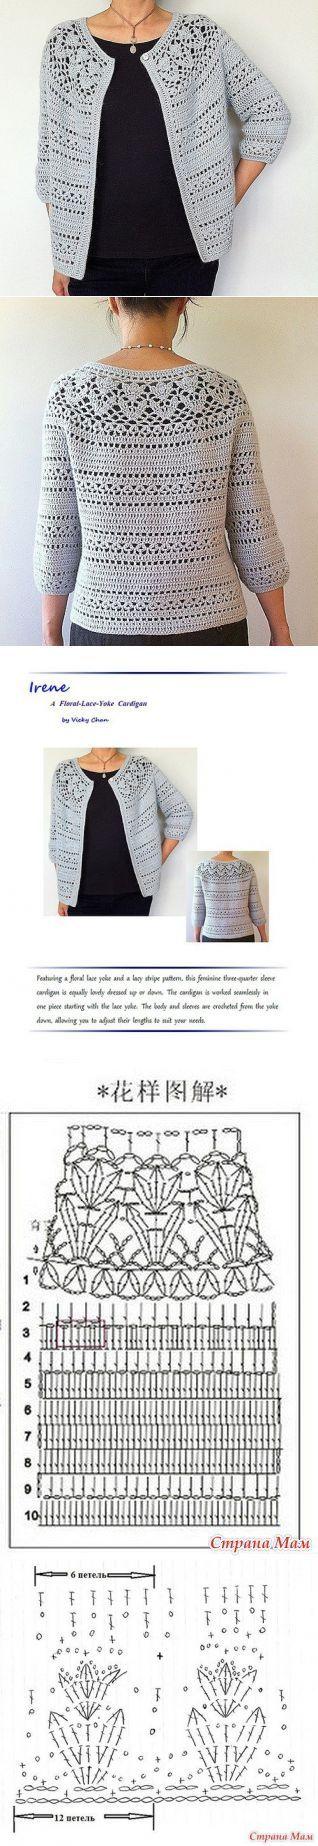 Pin de Martine Faucher en Crochet - Clothes / Vêtements | Pinterest ...